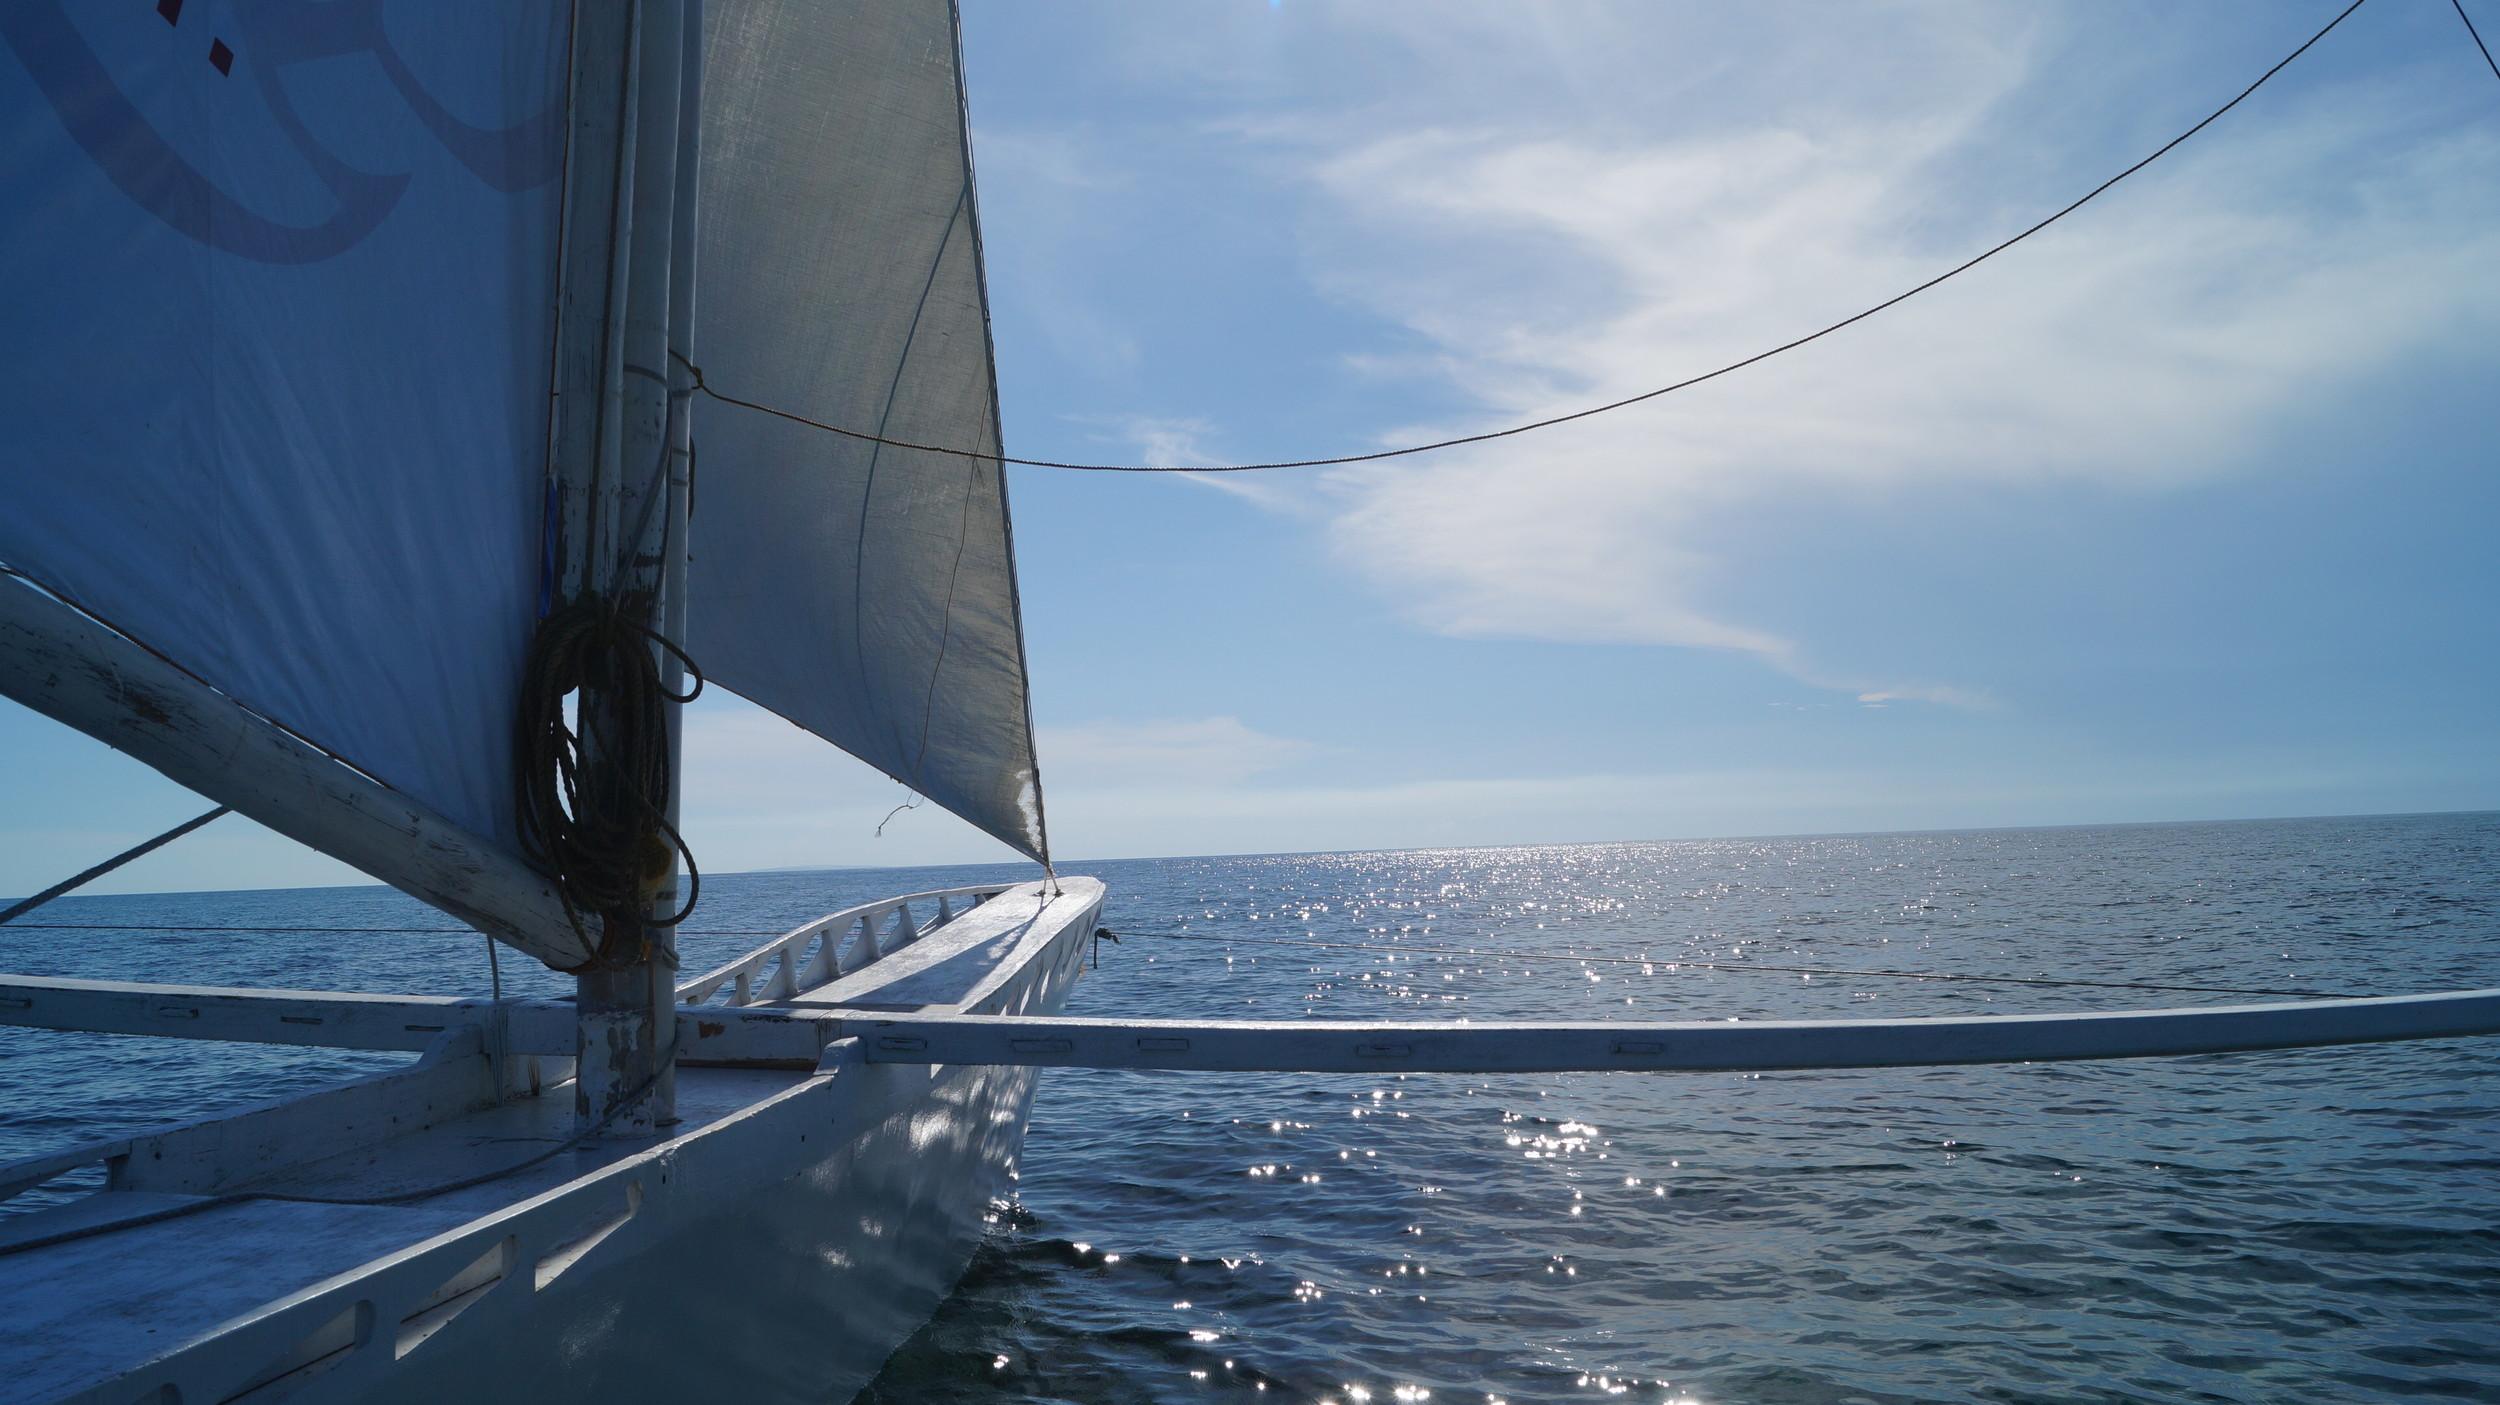 Local boatman on yacht with Boracay horizon